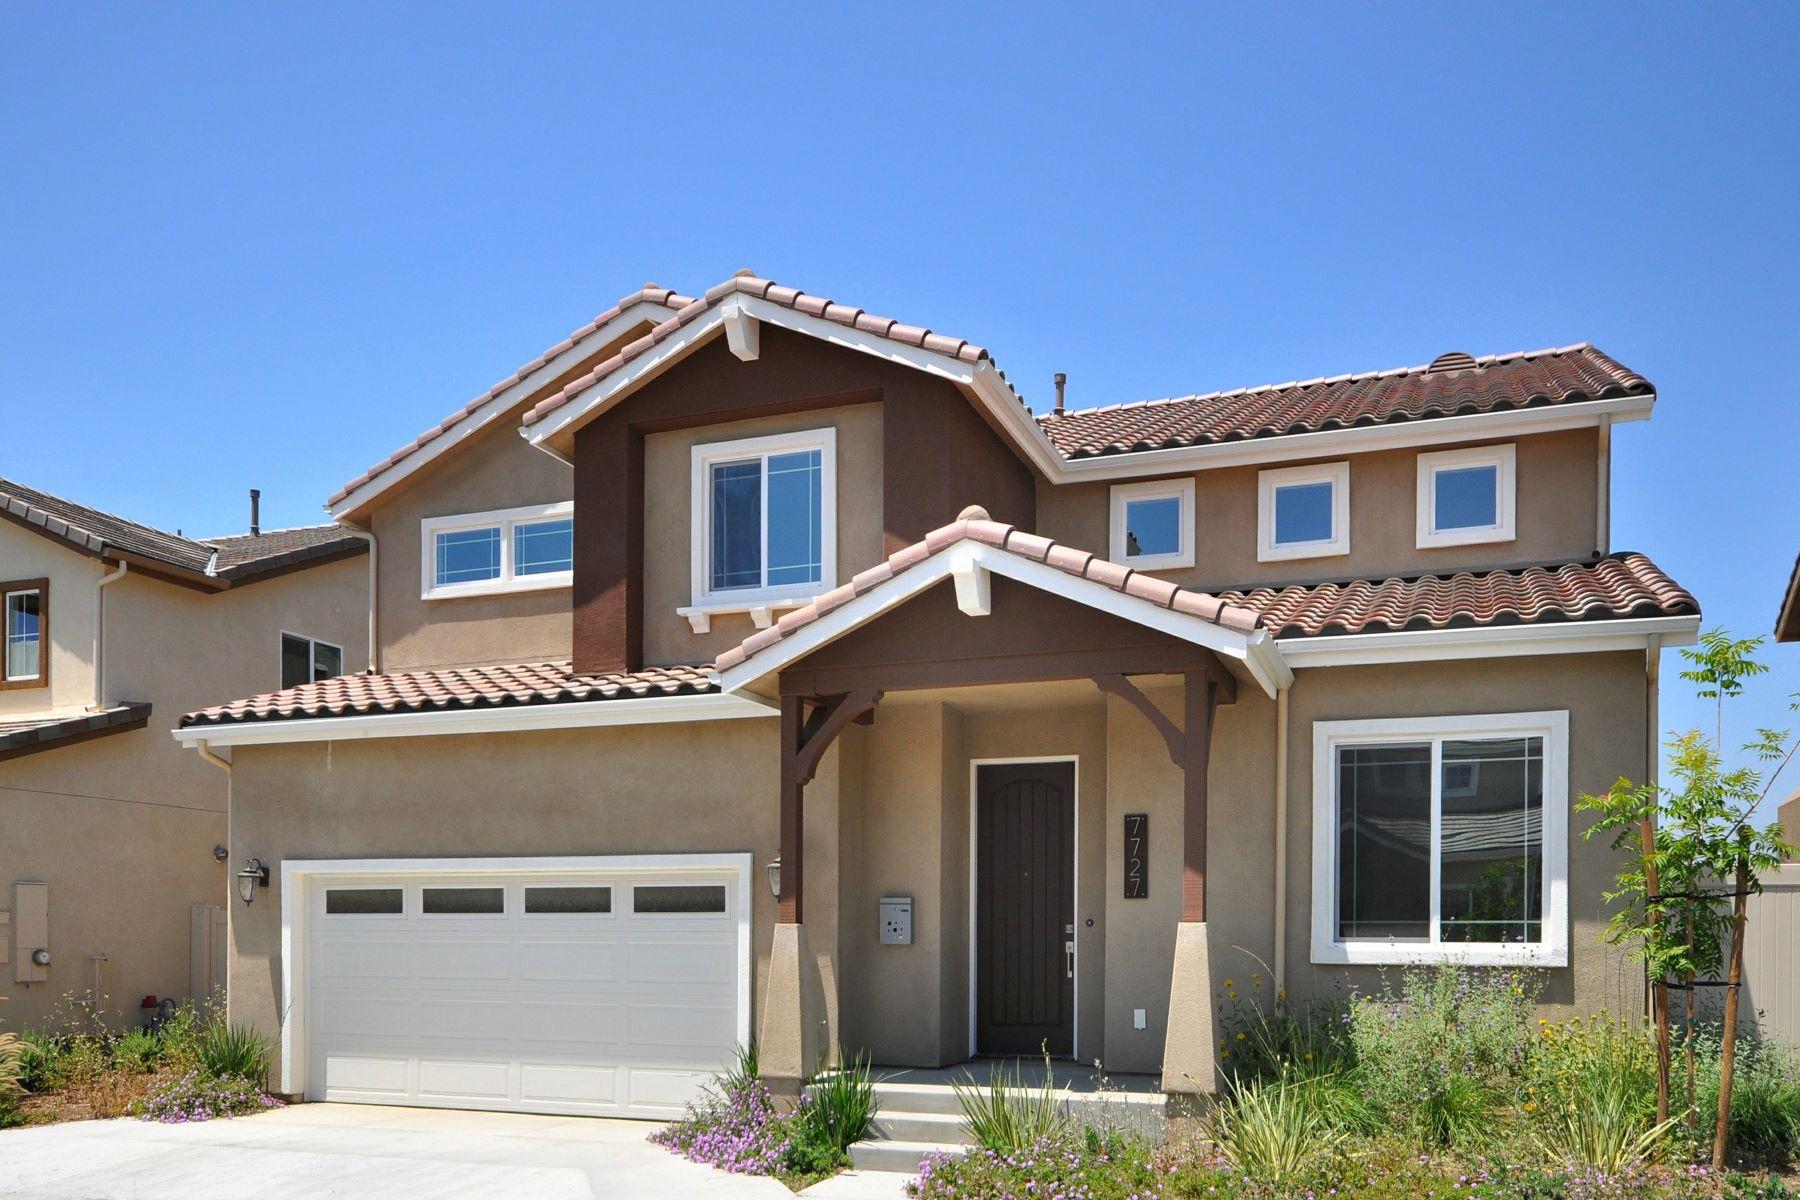 Single Family Home for Sale at 19719 Corbin Lane Winnetka, California 91306 United States